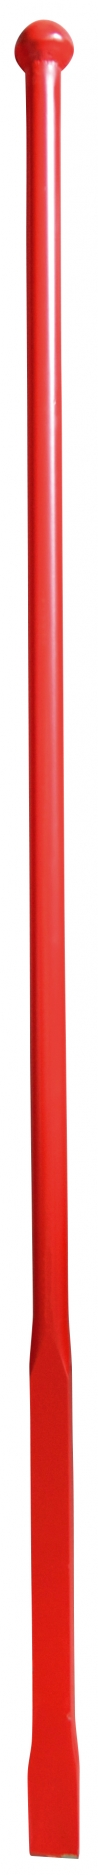 Breekstang rond Ø 28 mm - Vierkantig + beitel - 1400/400 mm